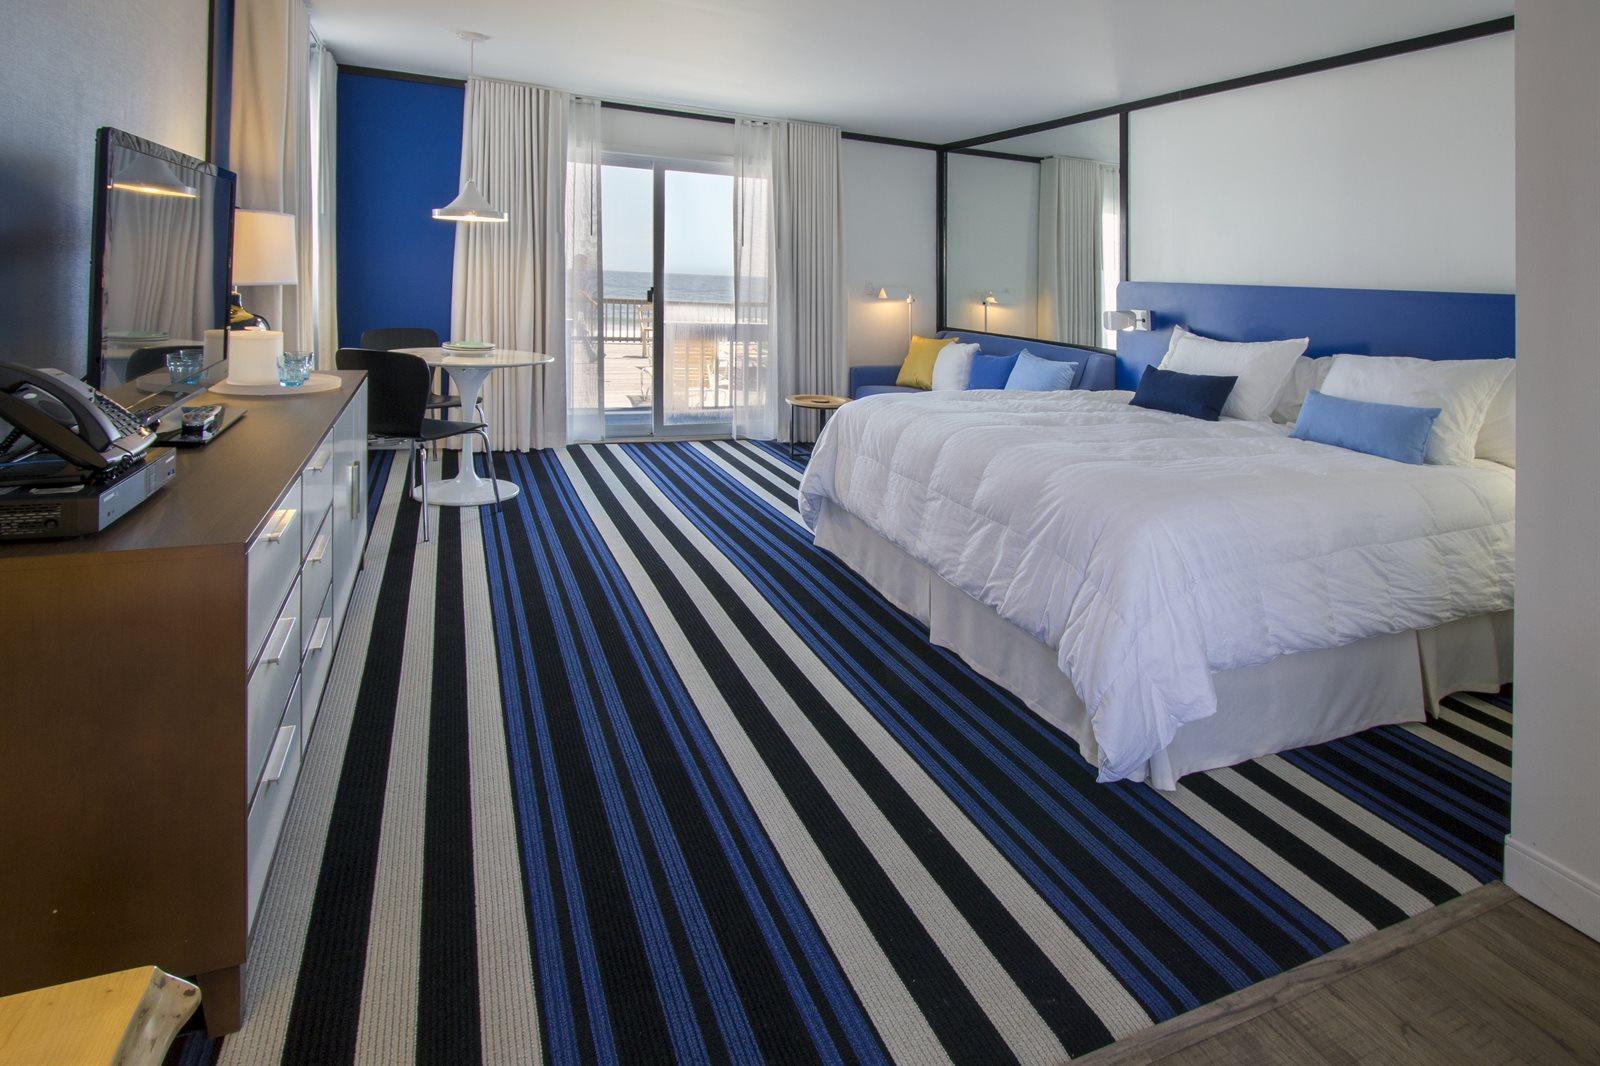 oceanfront hotel rooms in montauk ny montauk blue hotel. Black Bedroom Furniture Sets. Home Design Ideas